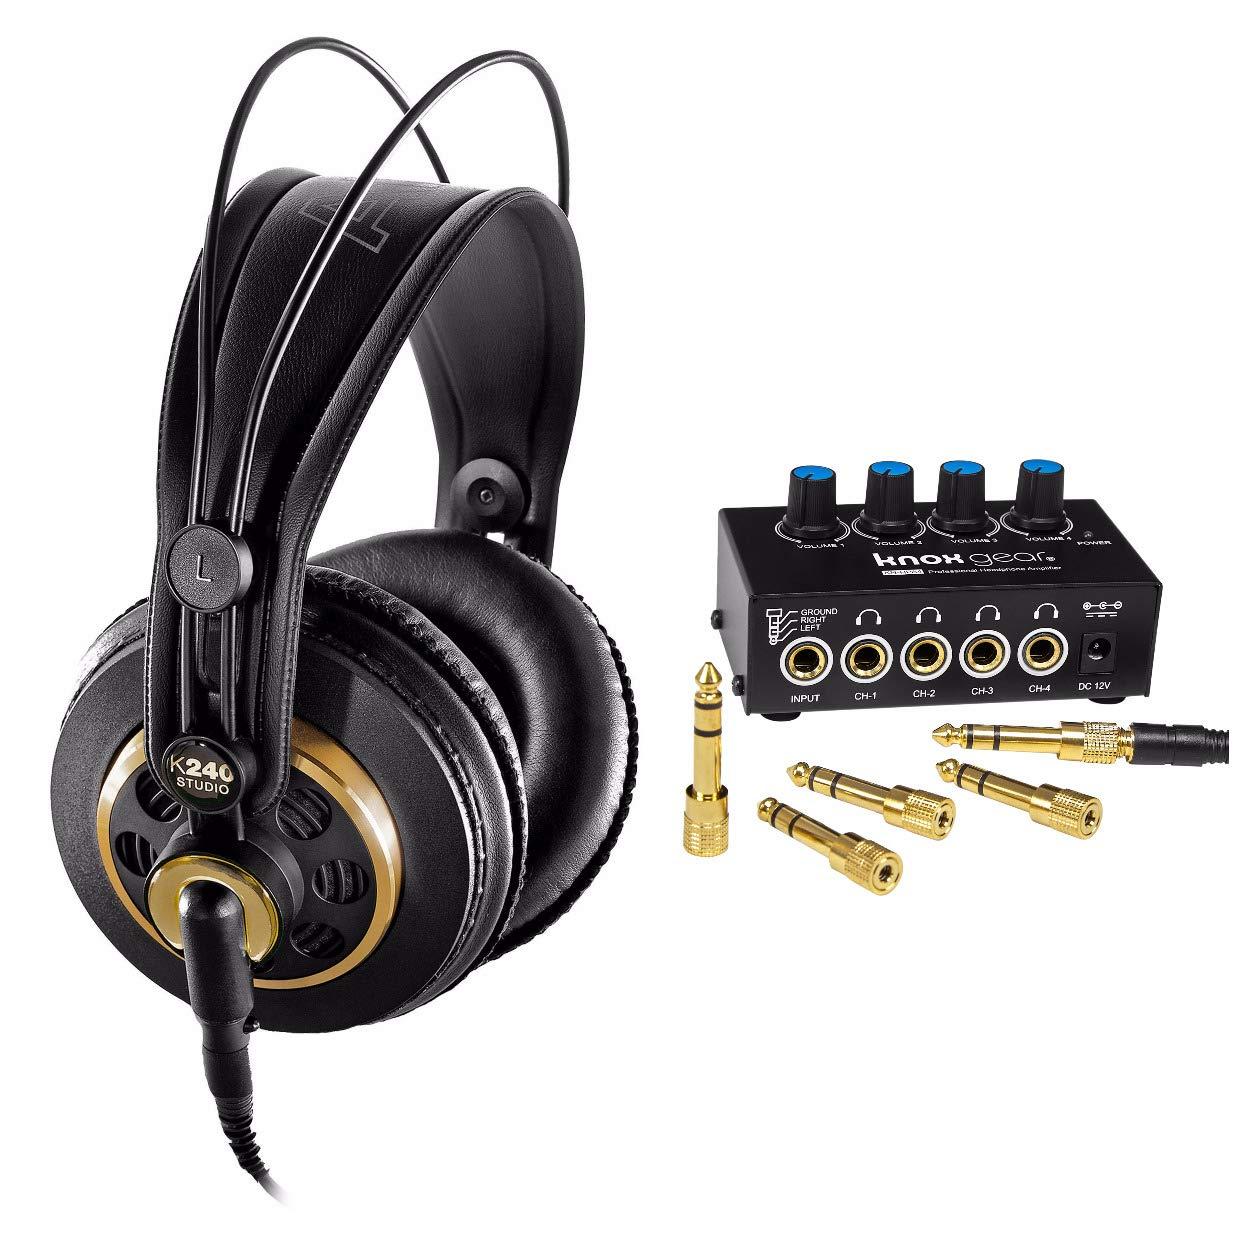 AKG K240 Studio Semi-Open Over-Ear Professional Studio Headphones with Knox Gear Headphone Amplifier